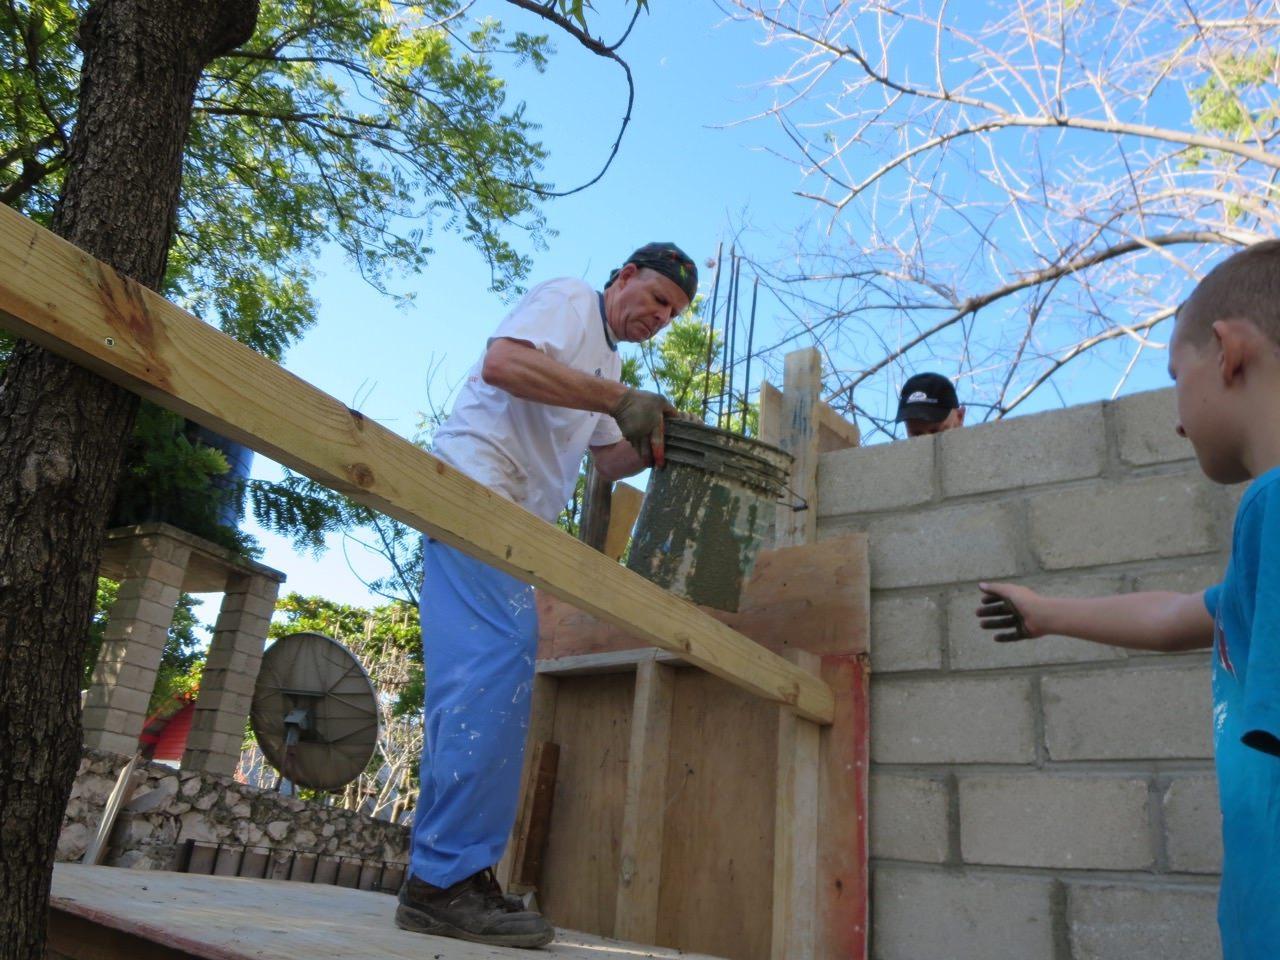 2014 Haiti wall - men at work